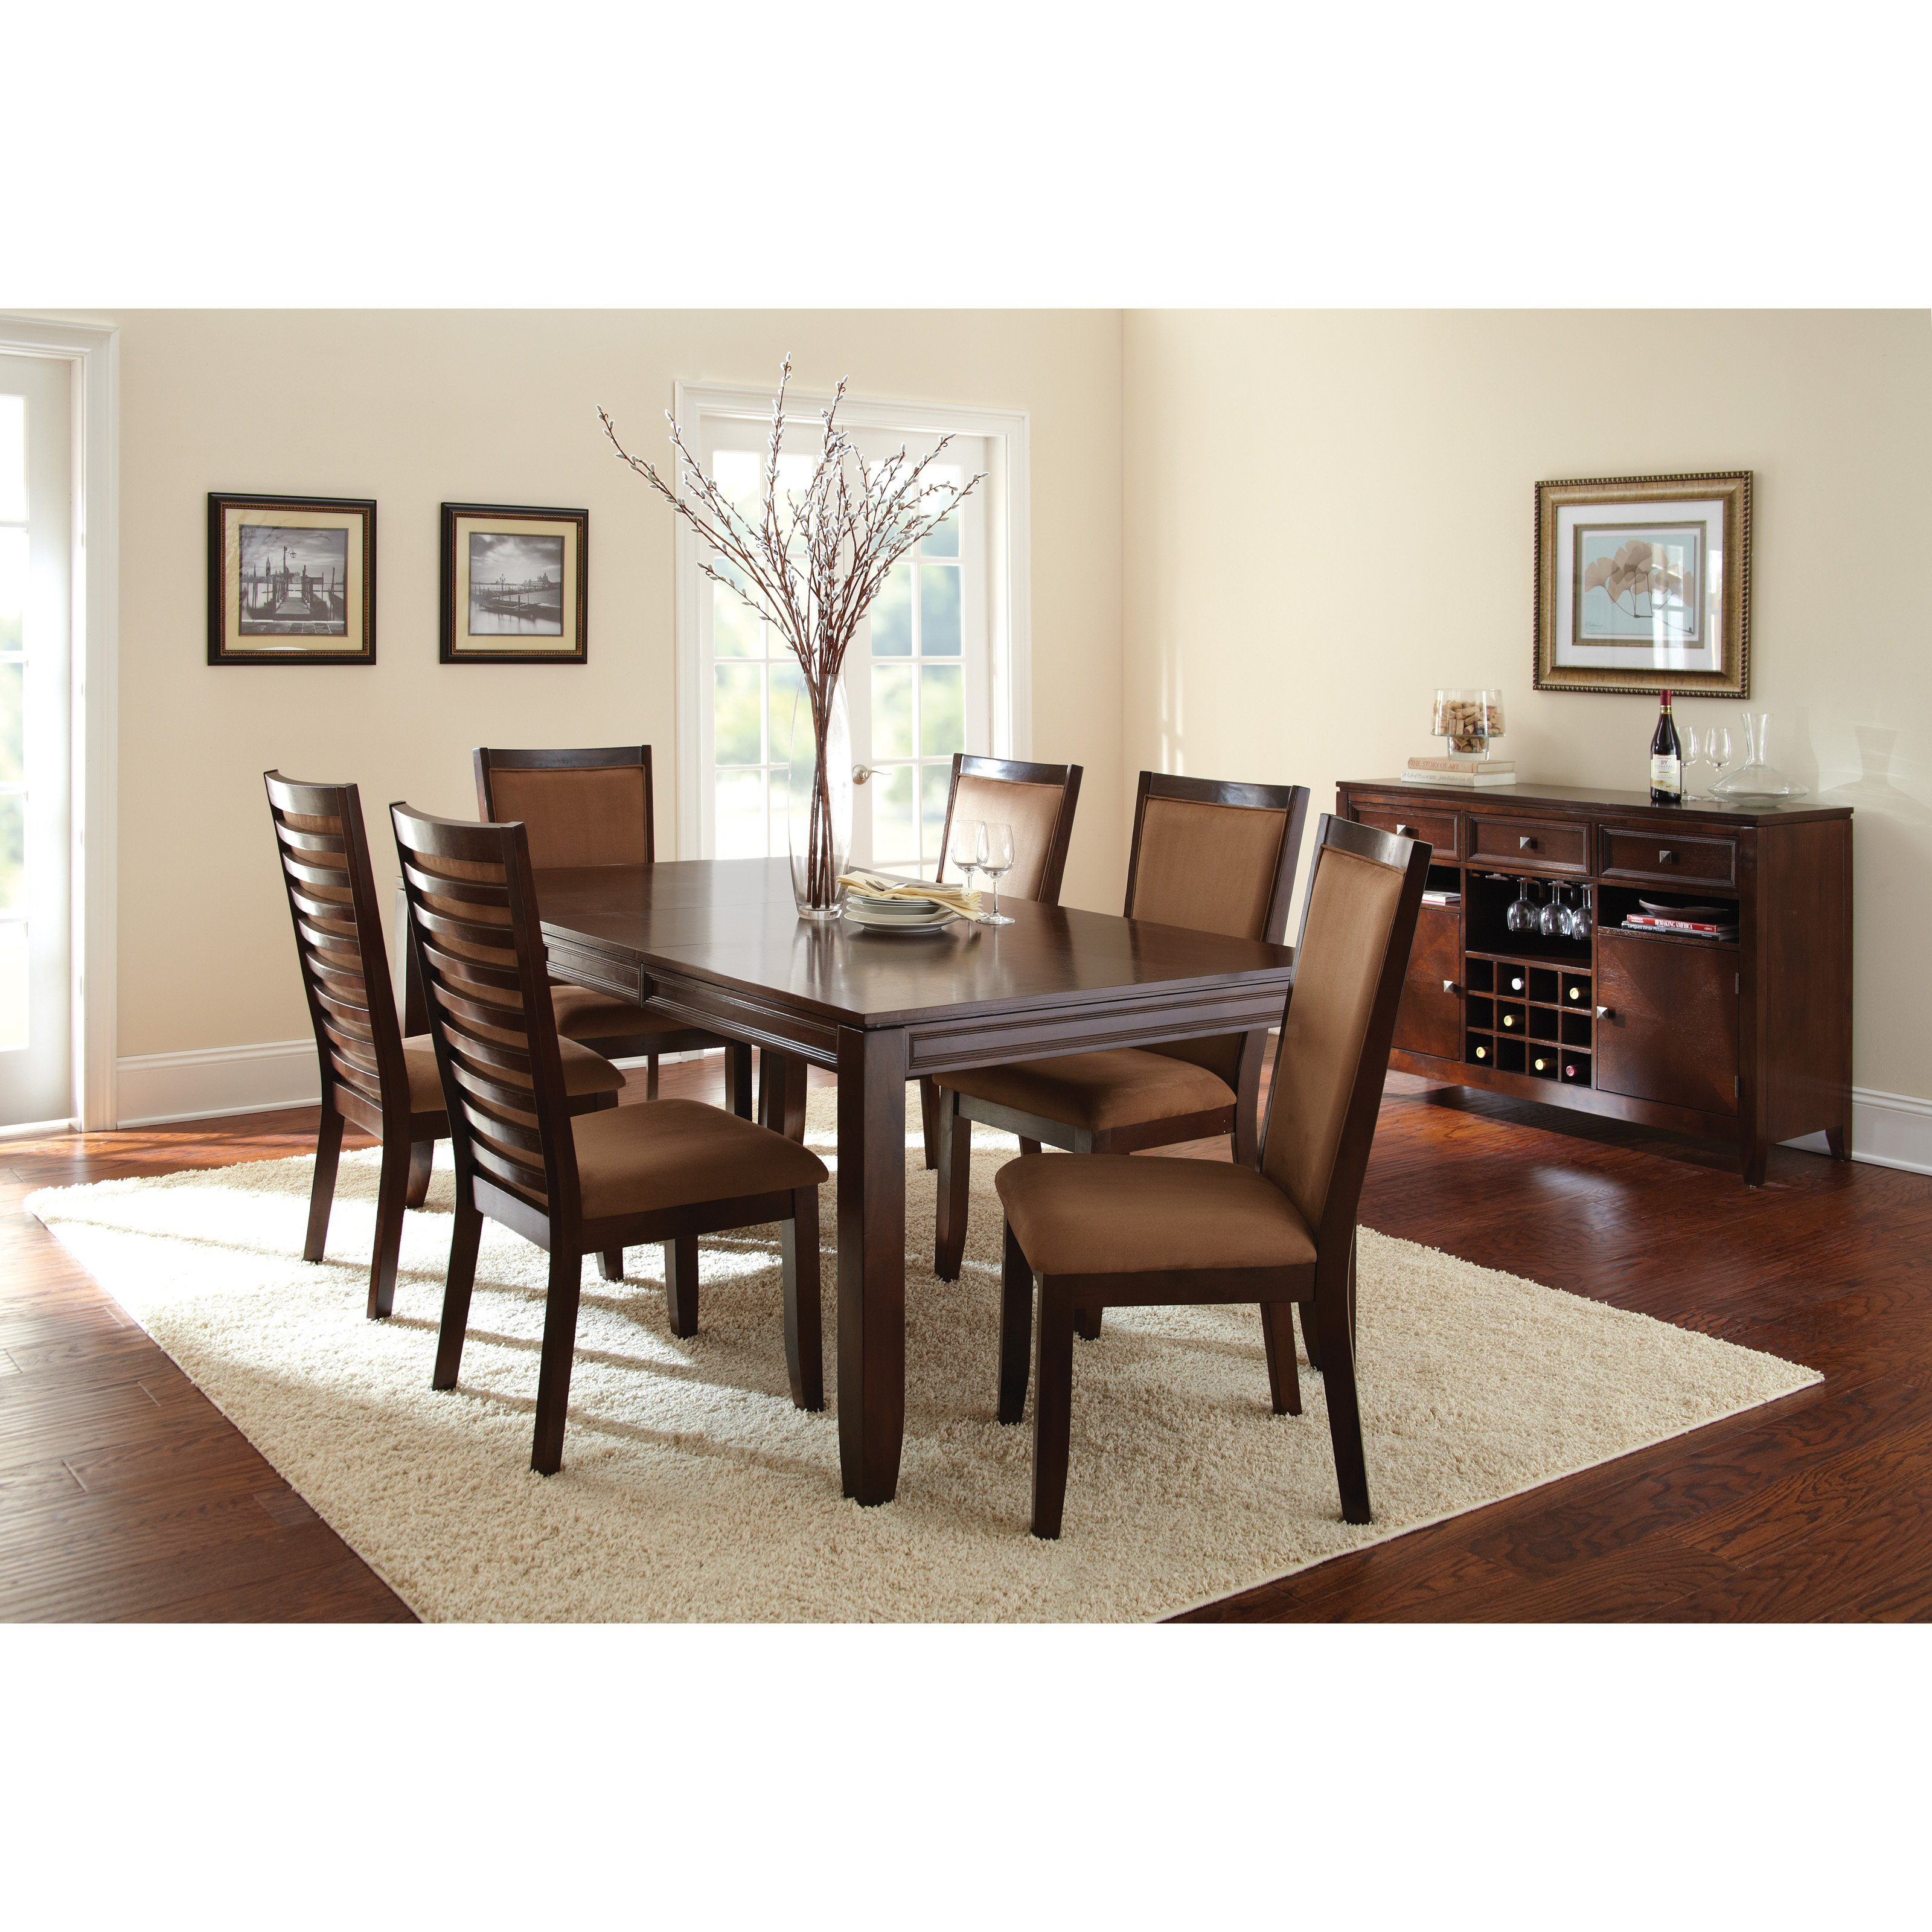 Steve Silver Cornell 7 Piece Dining Table Set   Espresso   Walmart.com